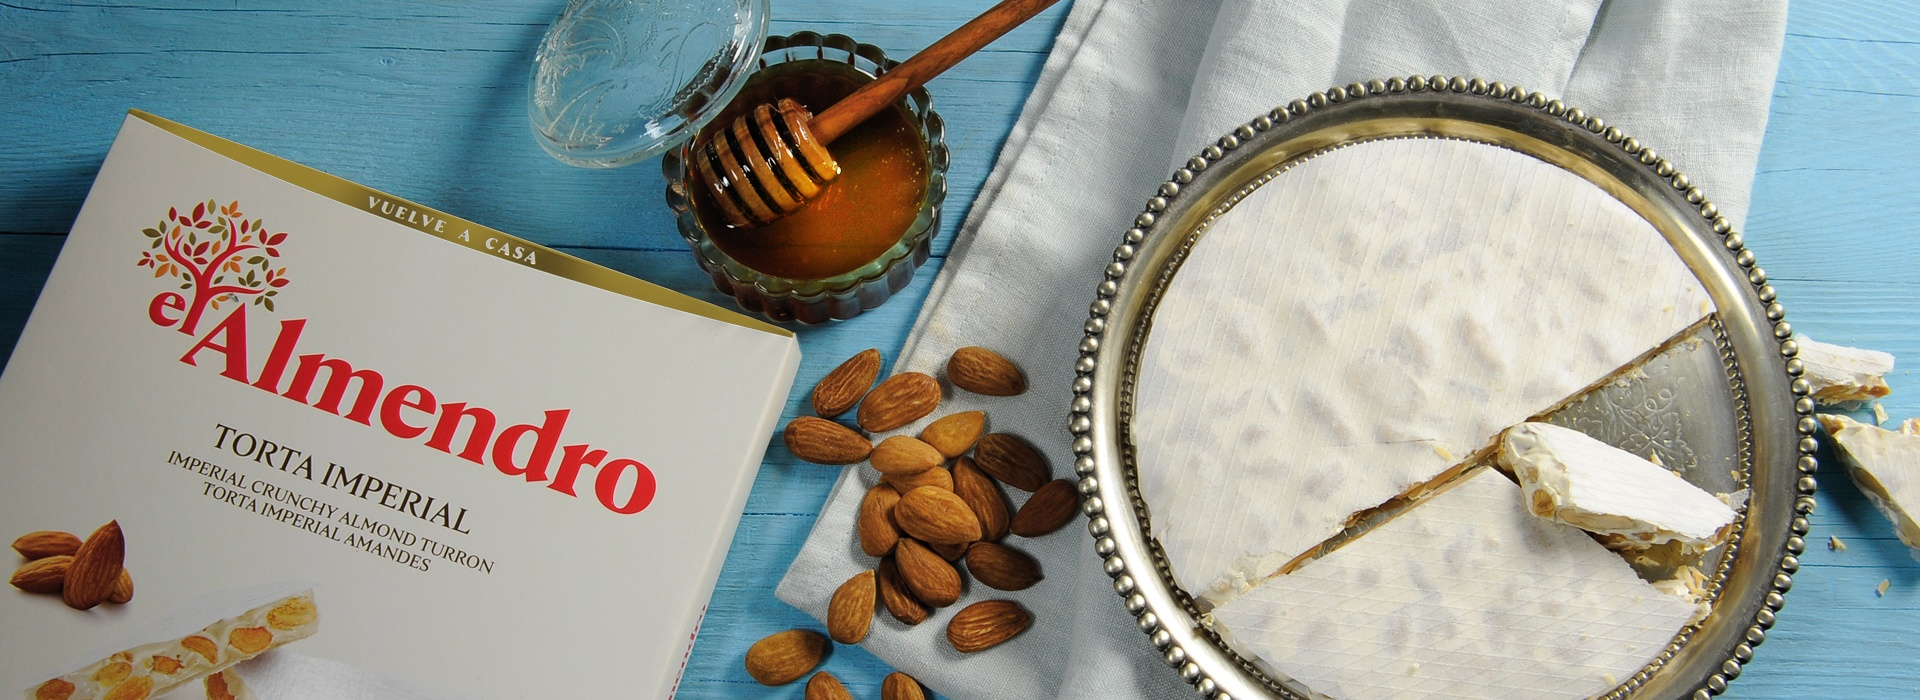 Top Food Feinkost - El Almendro - Turrón Torta Imperial